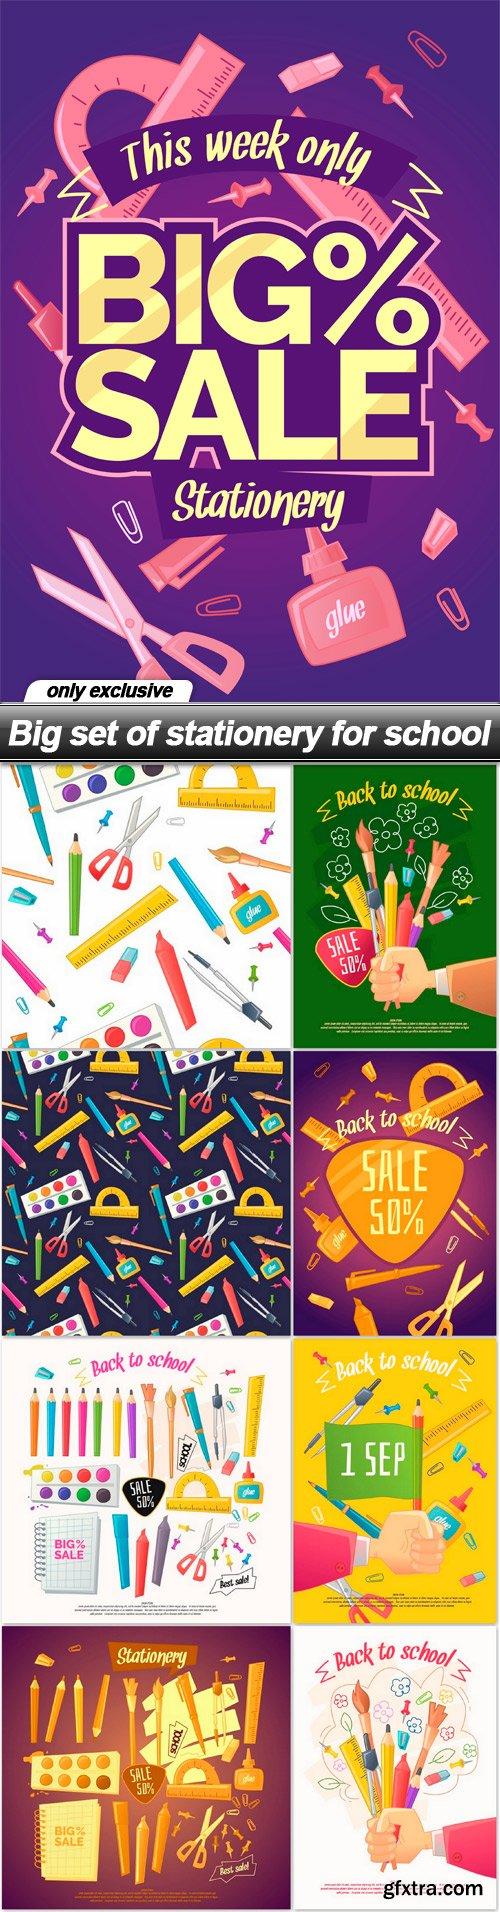 Big set of stationery for school - 9 EPS